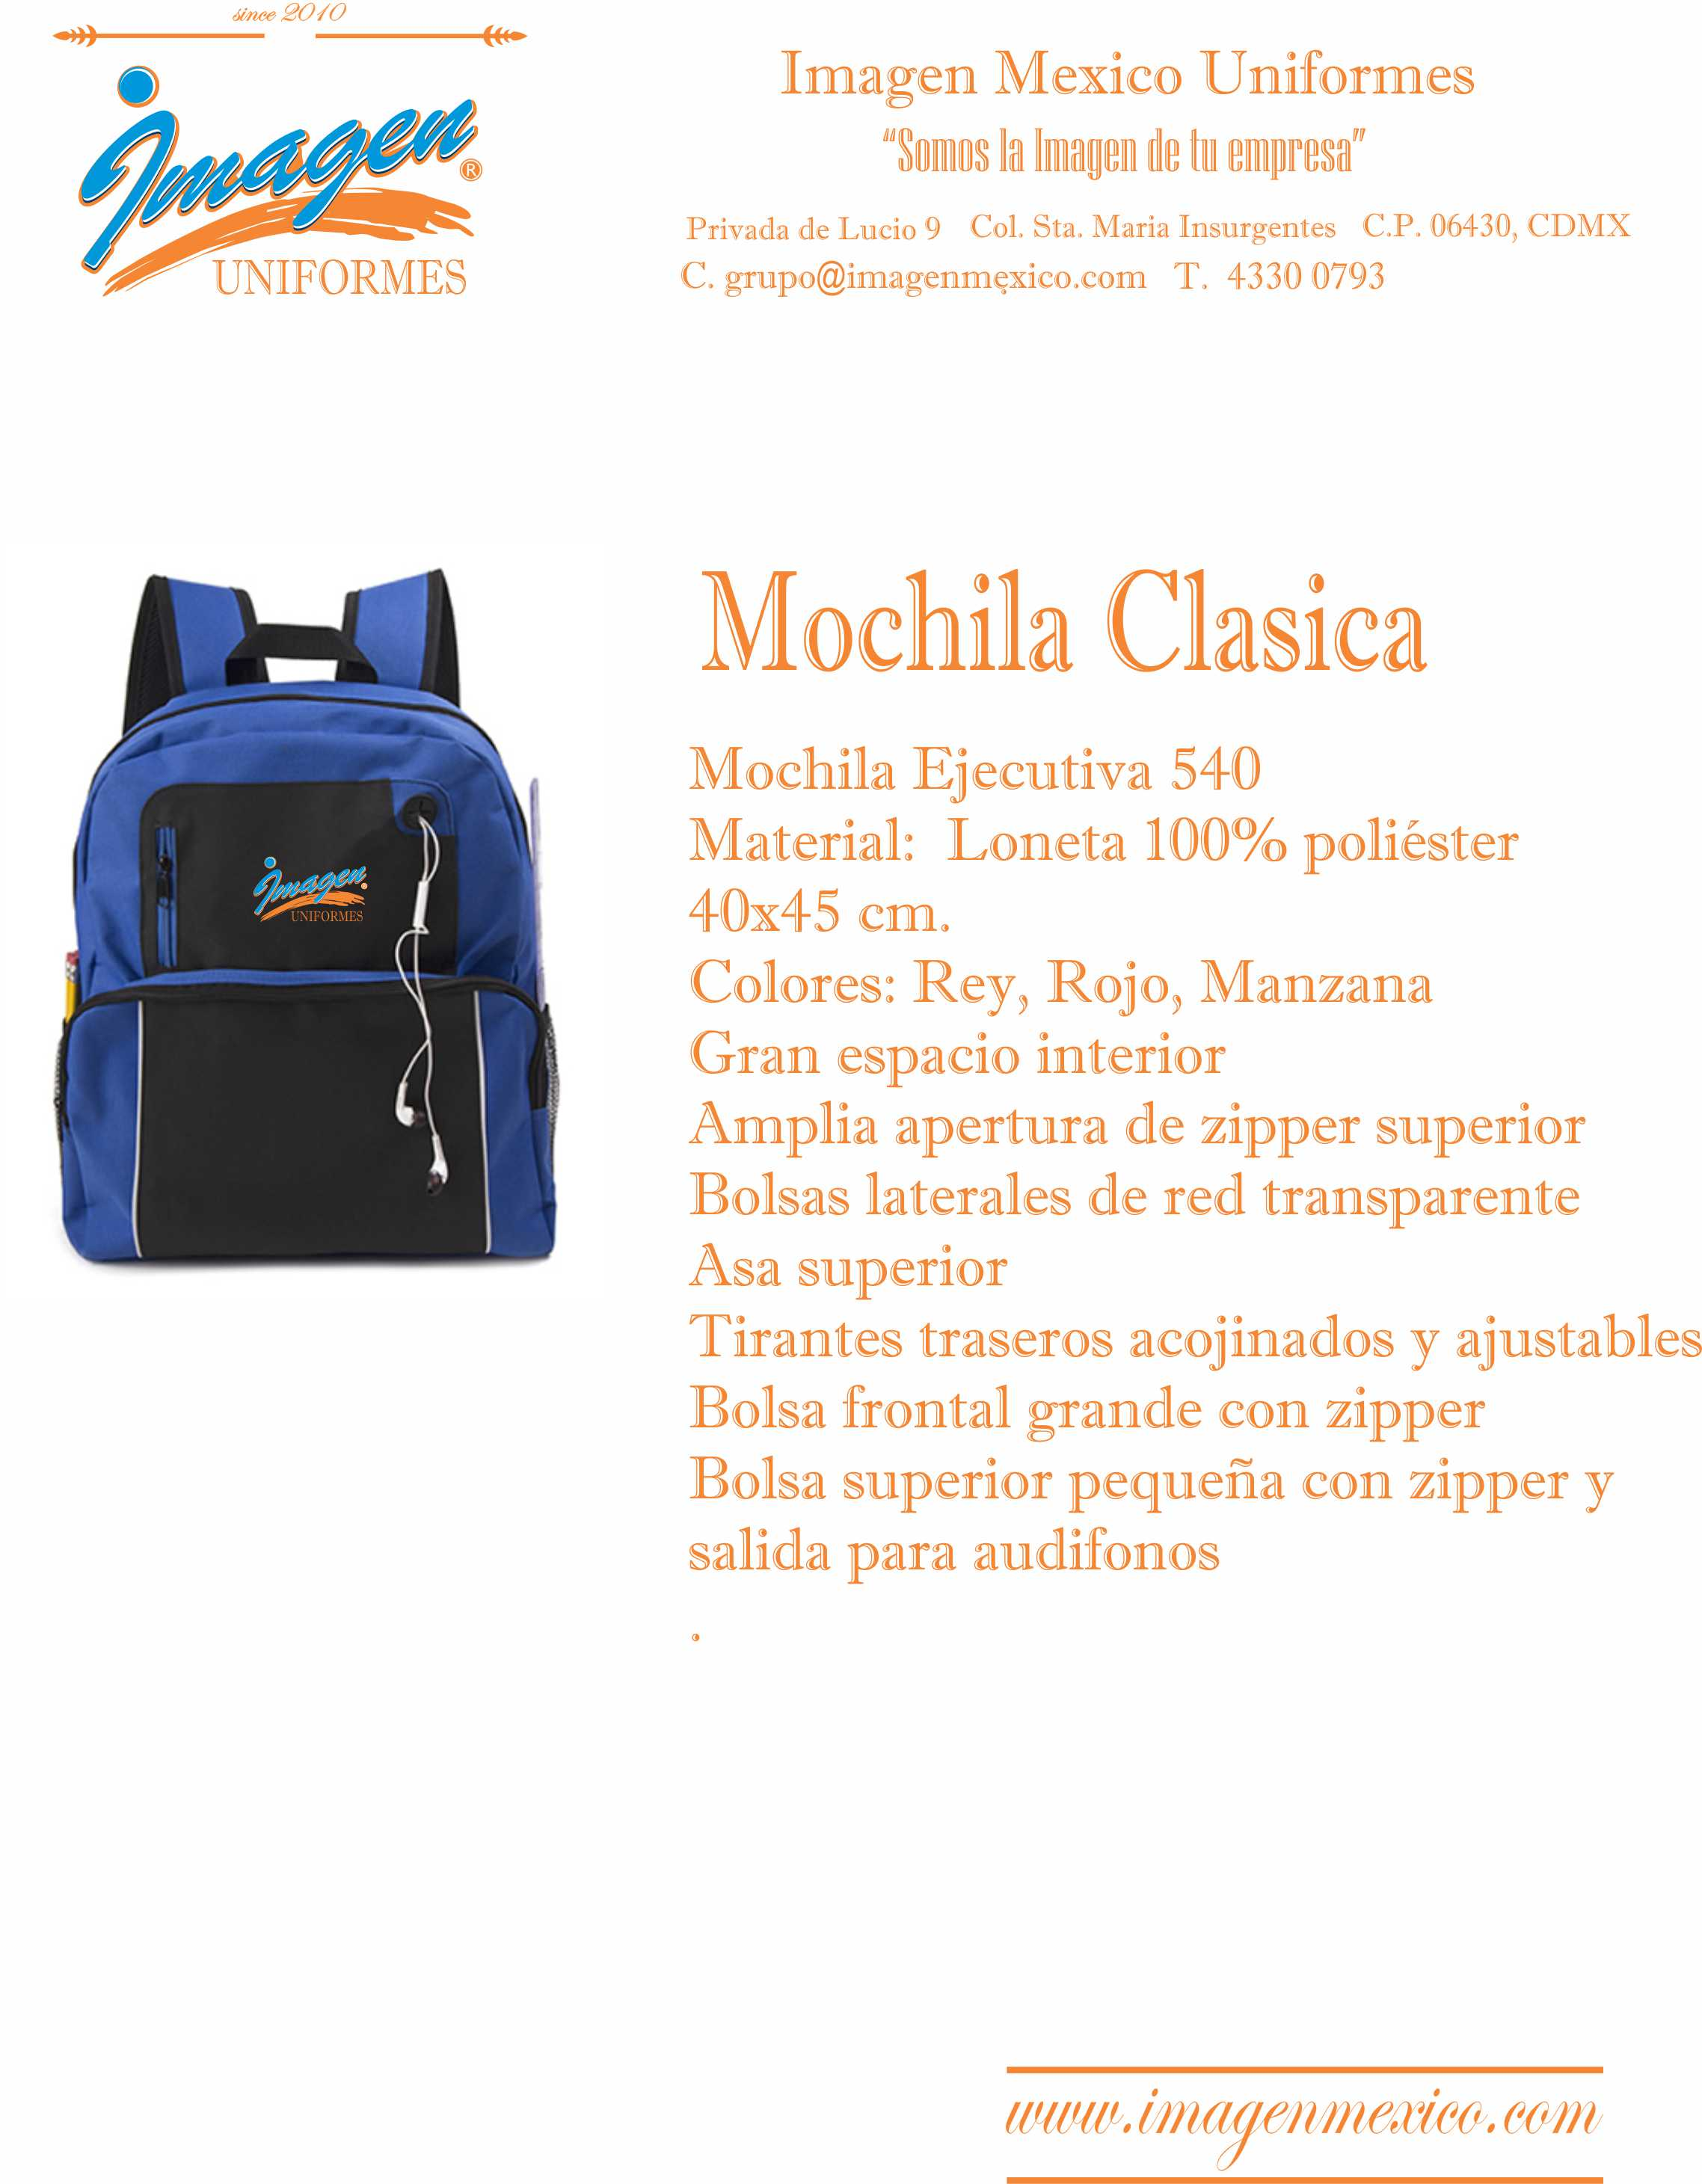 MOCHILA CLASICA